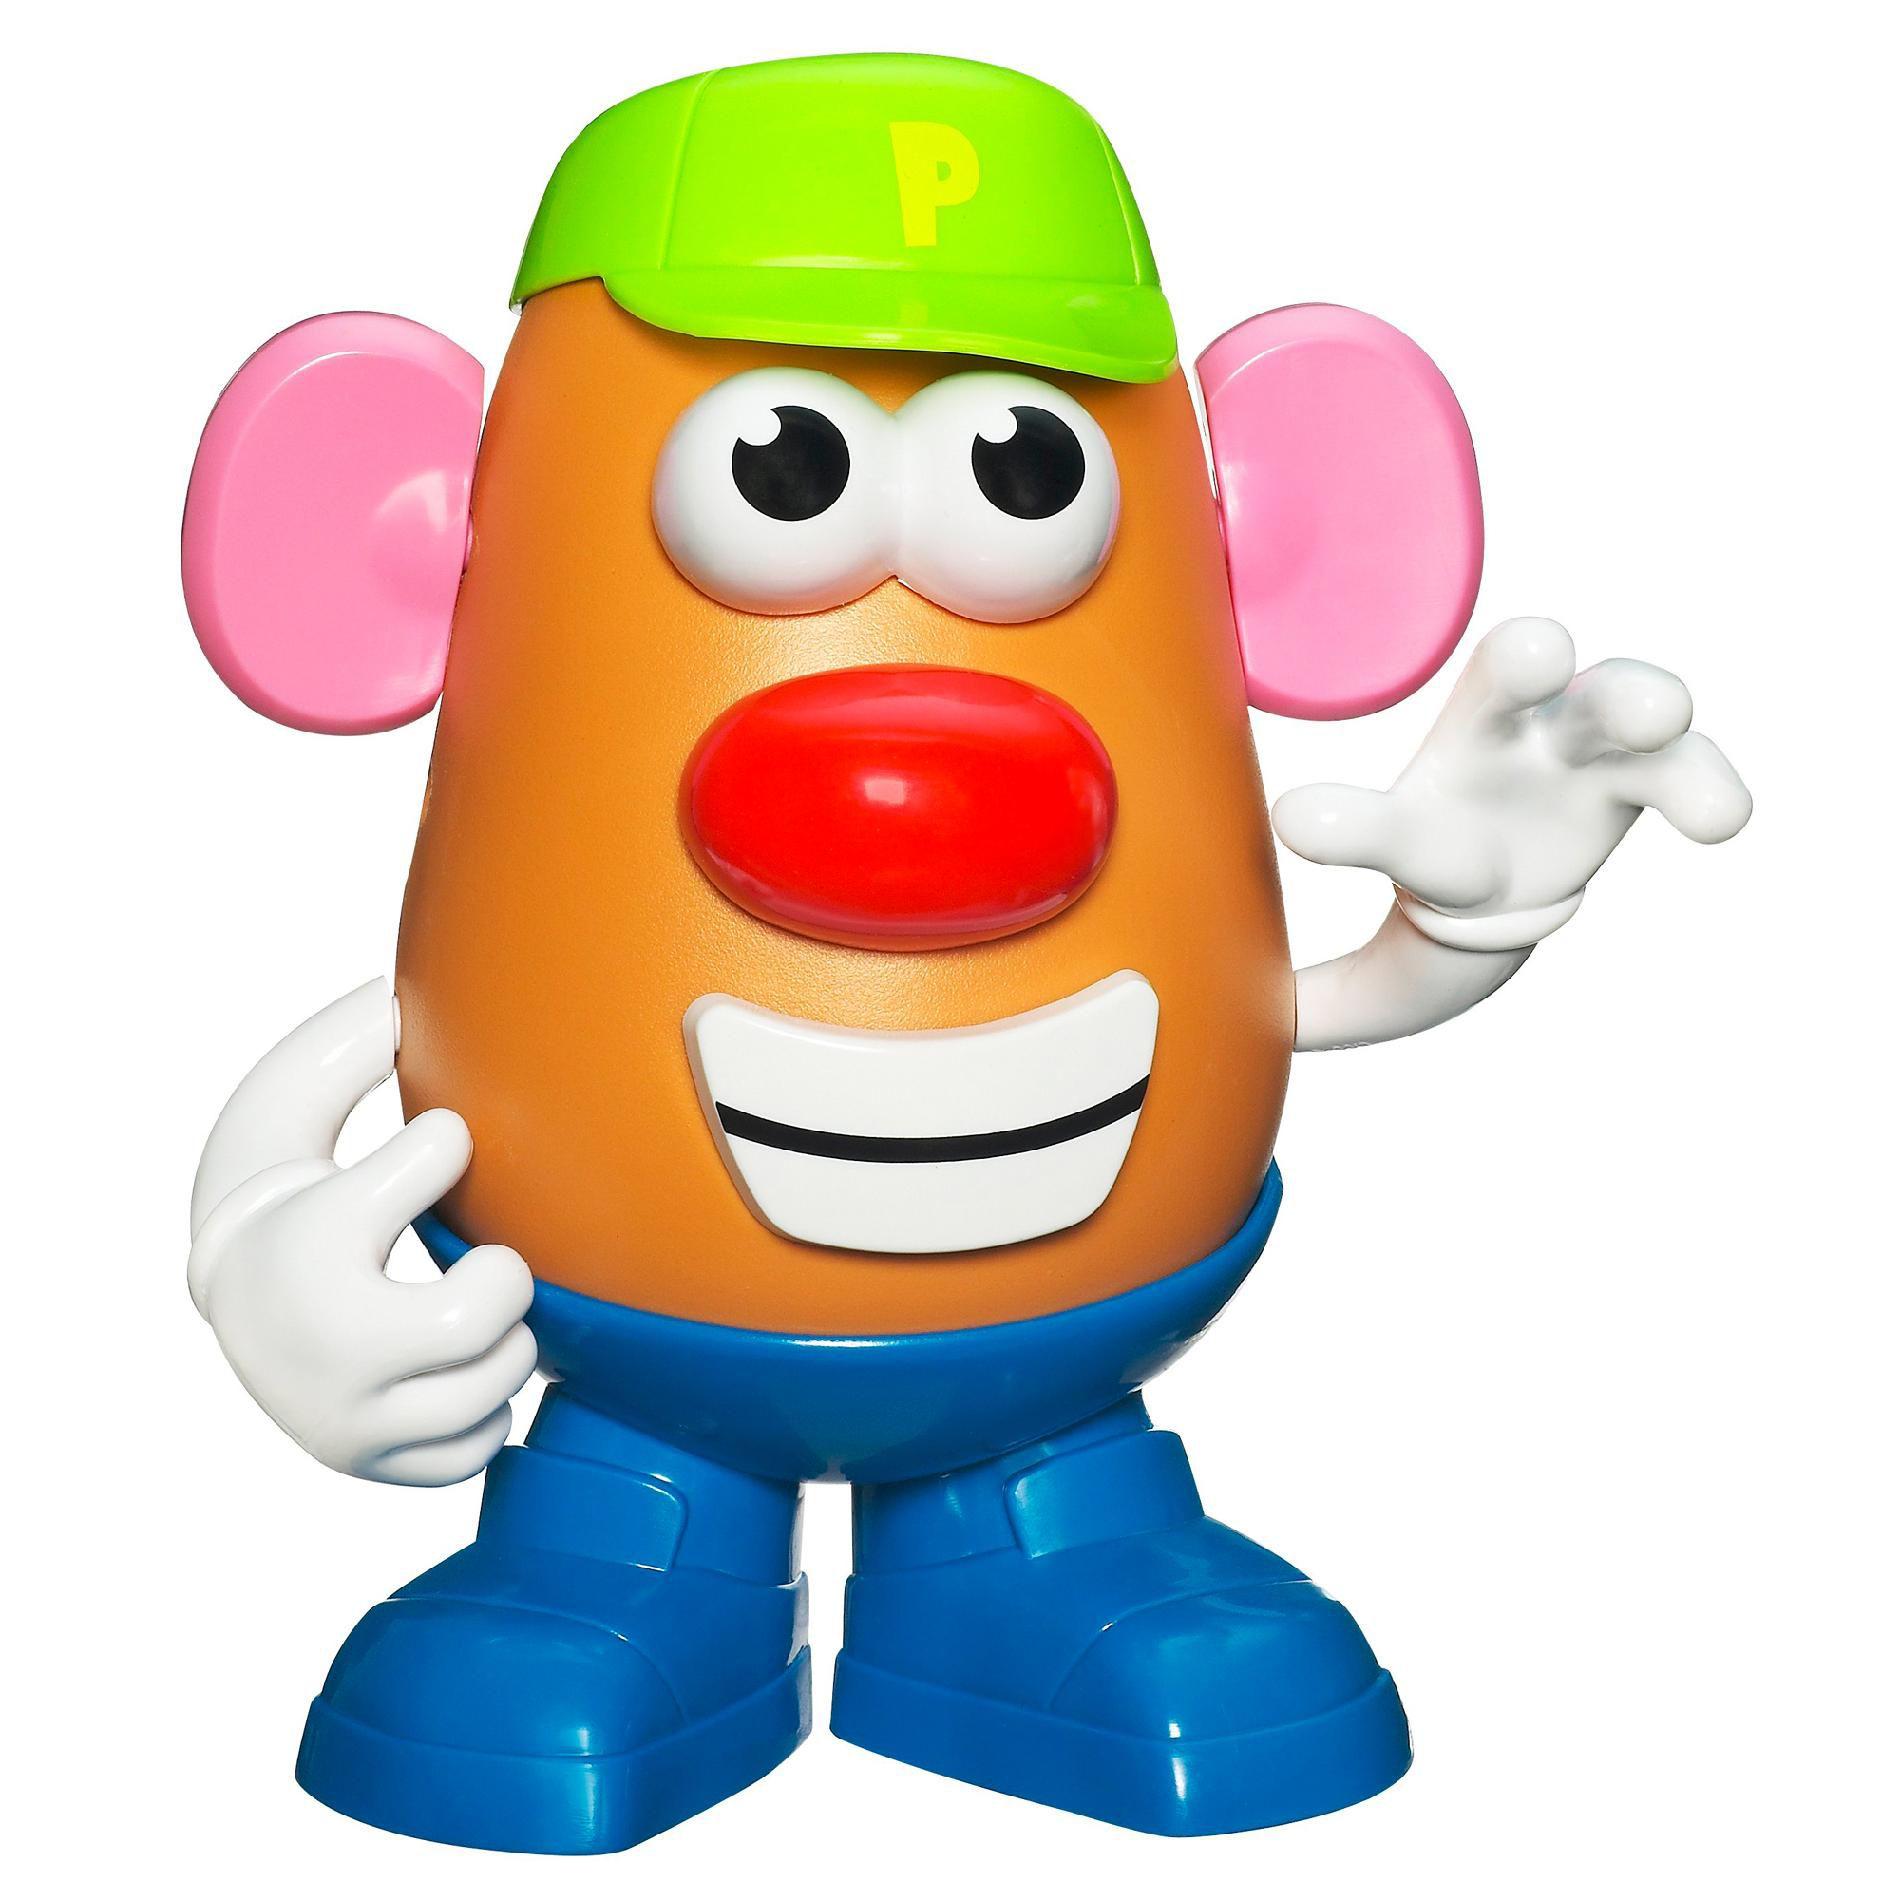 Playskool . Potato Head Figure